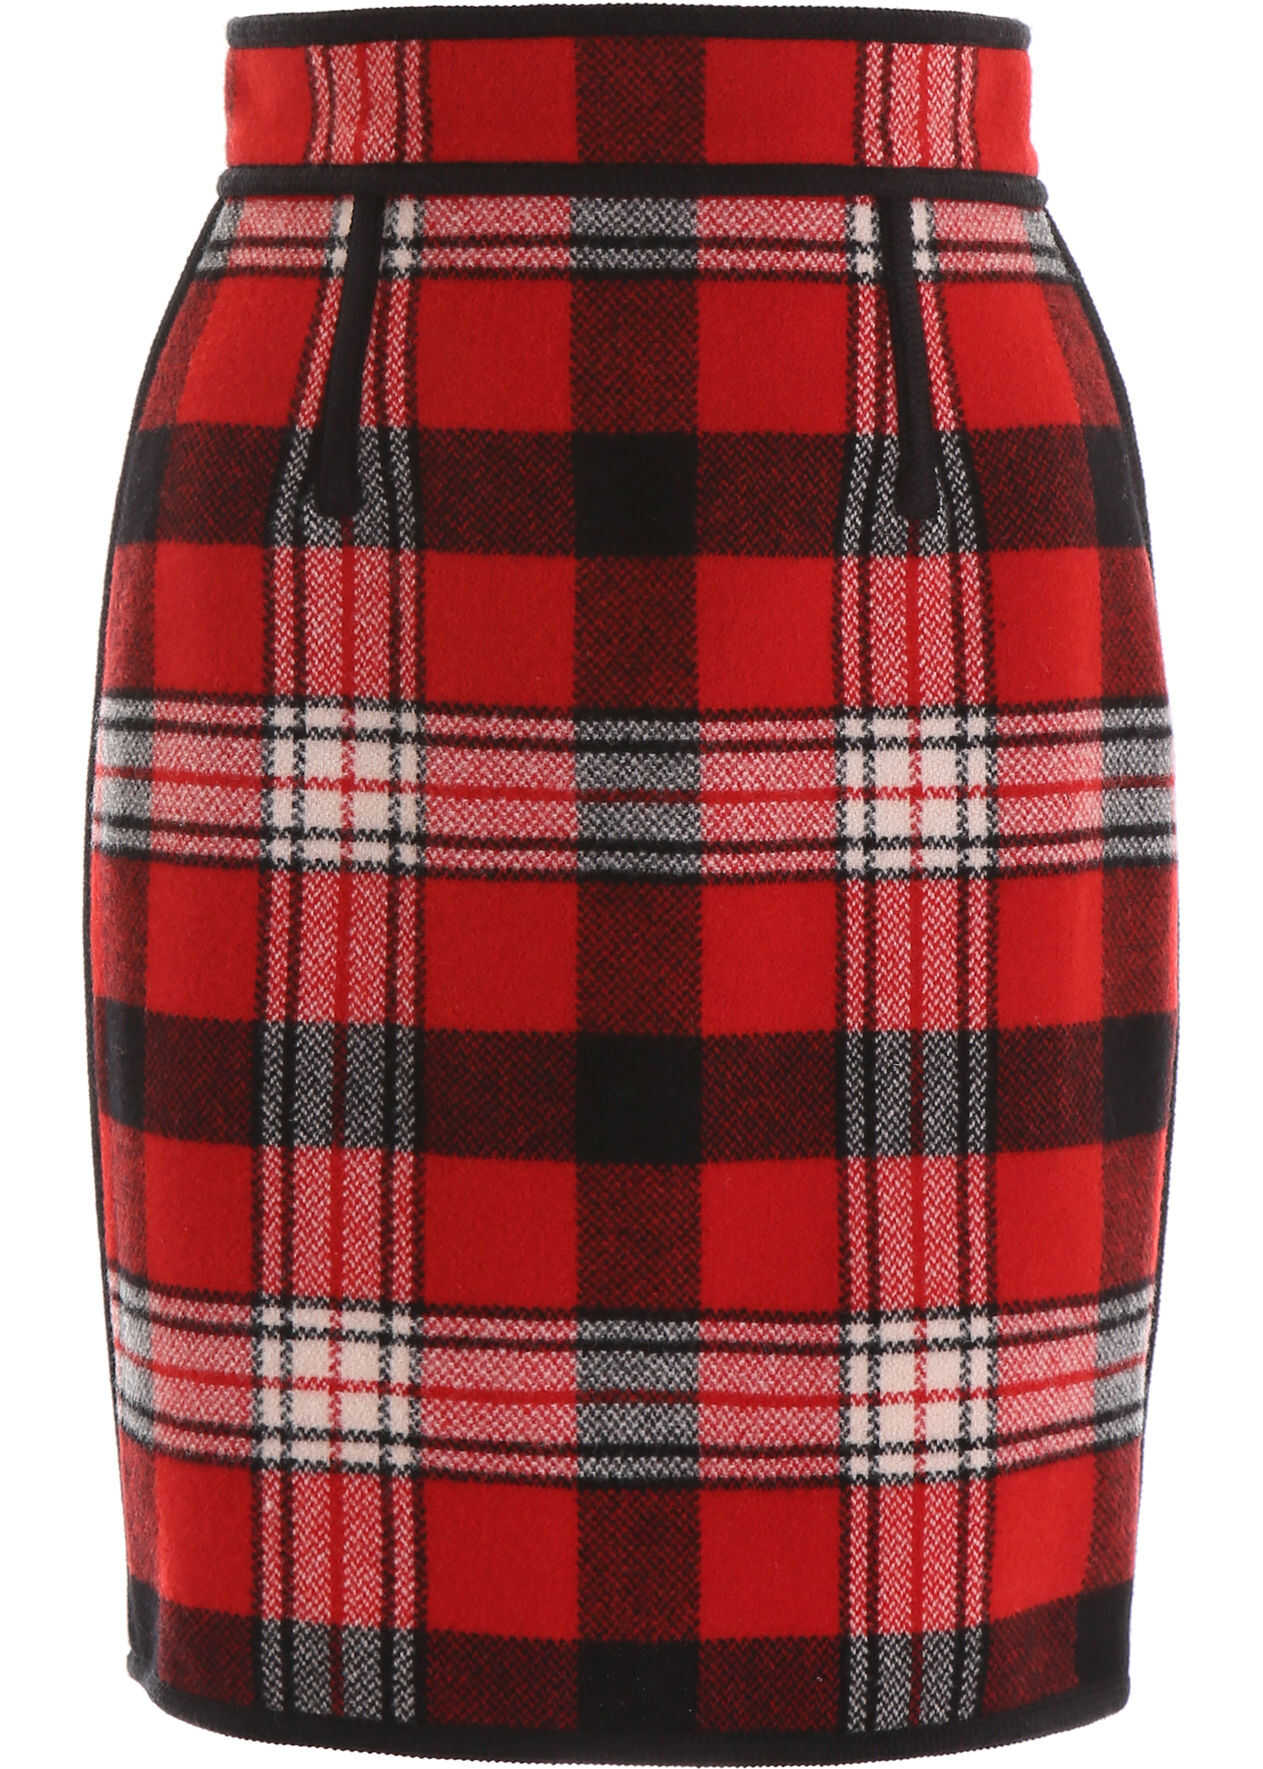 DSQUARED2 Tartan Mini Skirt RED BLACK OFF WHITE